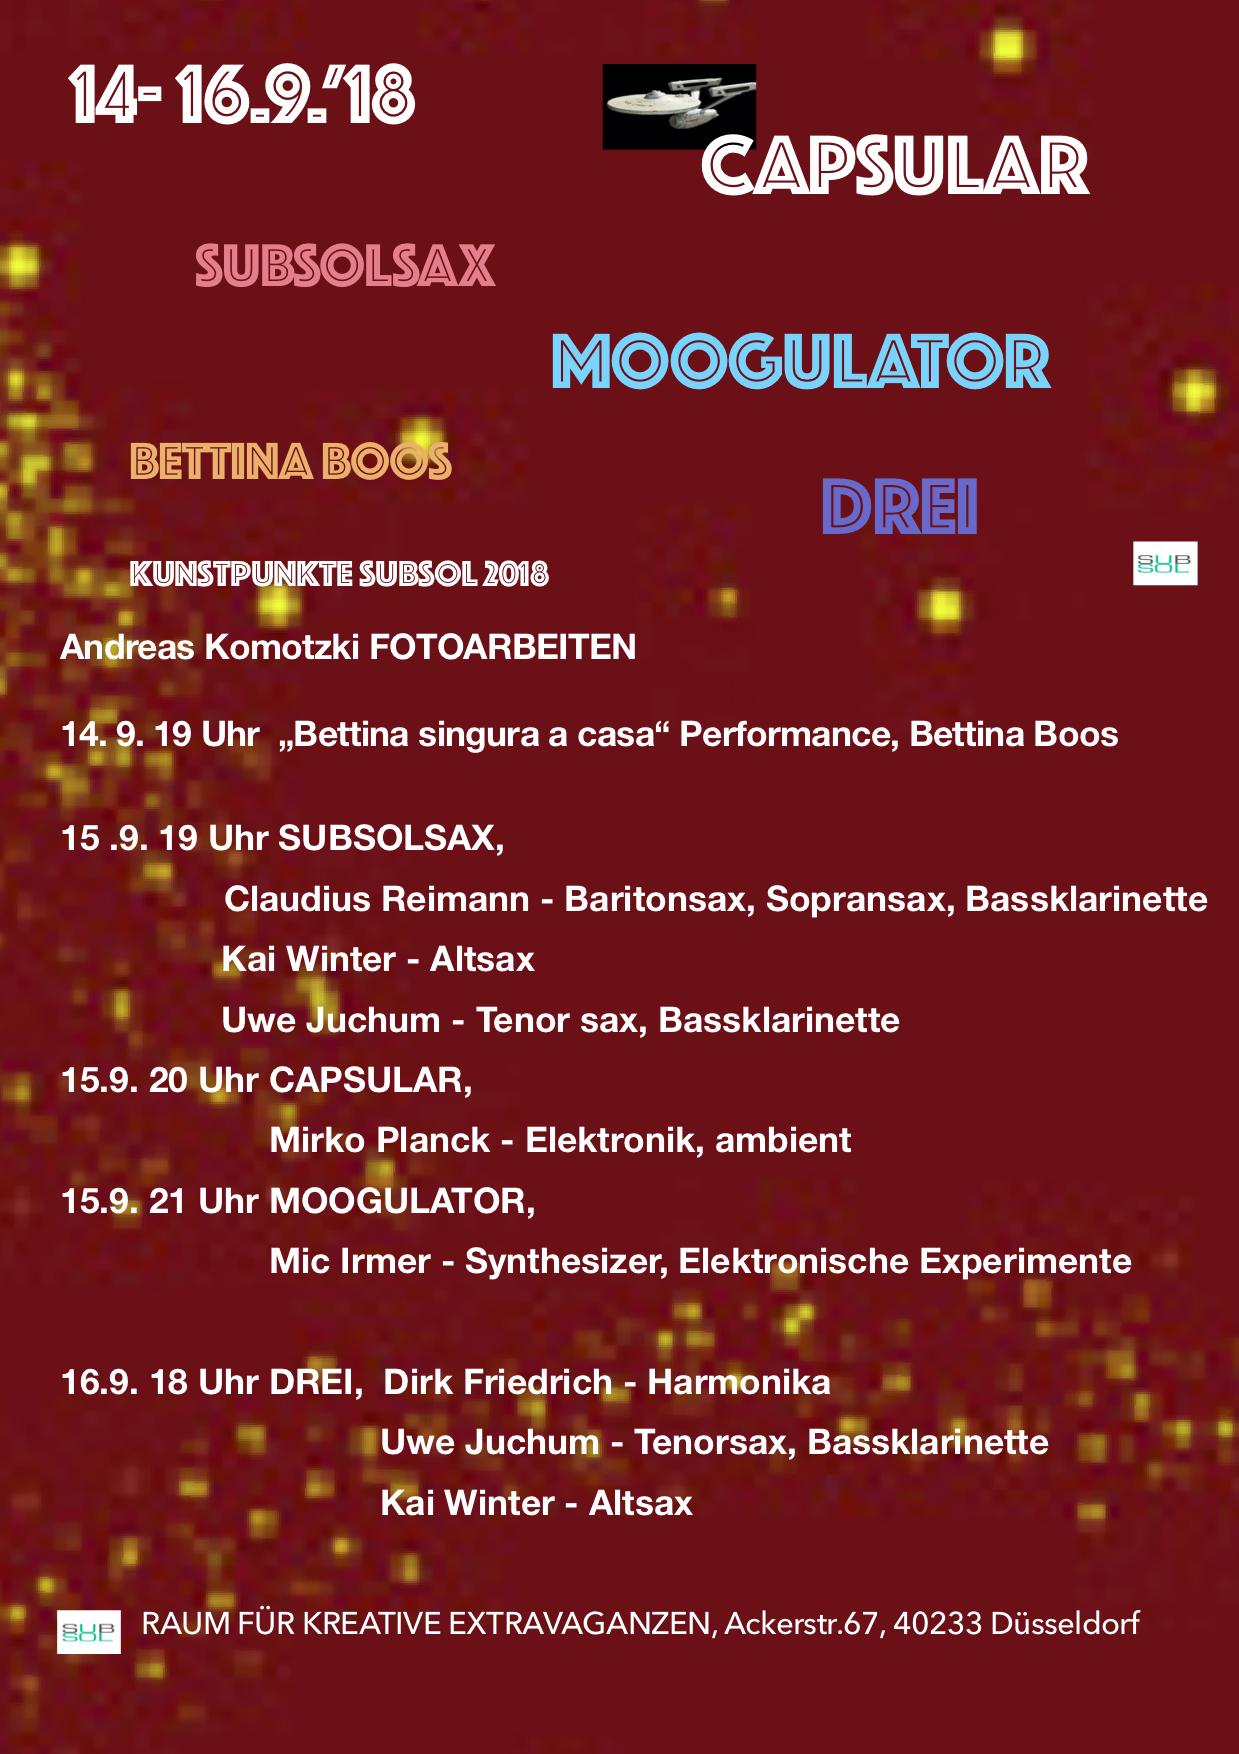 Kunstpunkte 15. Moogulator / Capsular